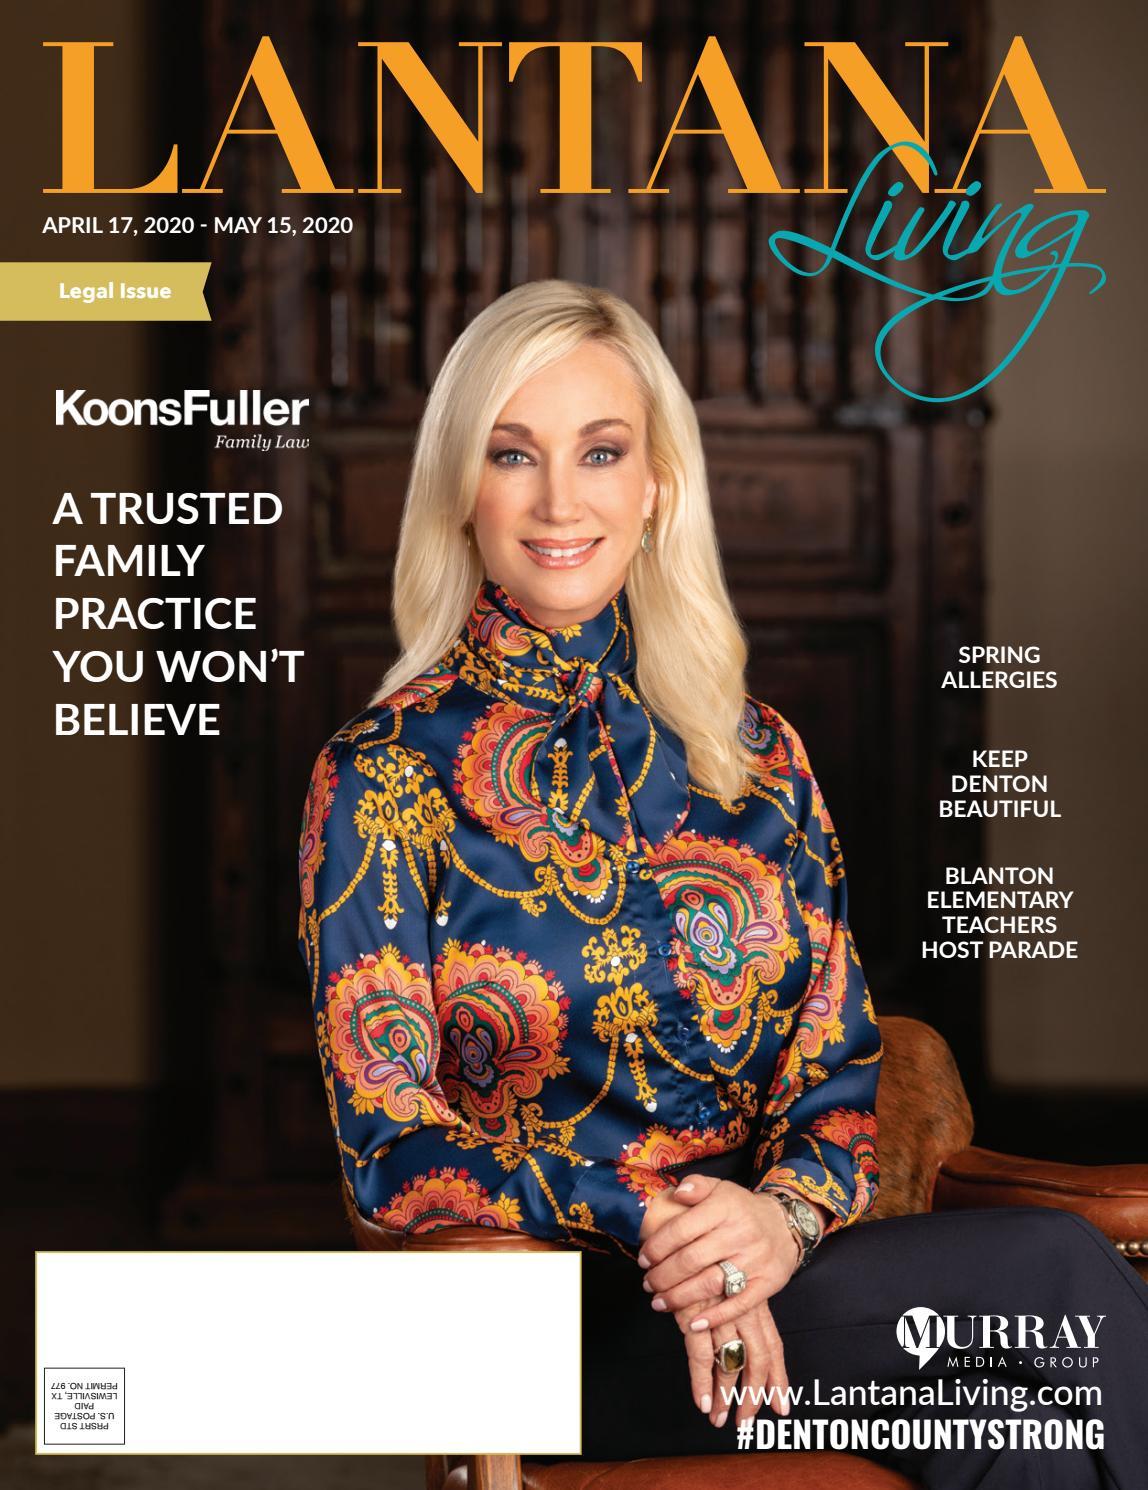 Lantana Texas Halloween 2020 Lantana Living Magazine April 2020 by Murray Media Group   issuu